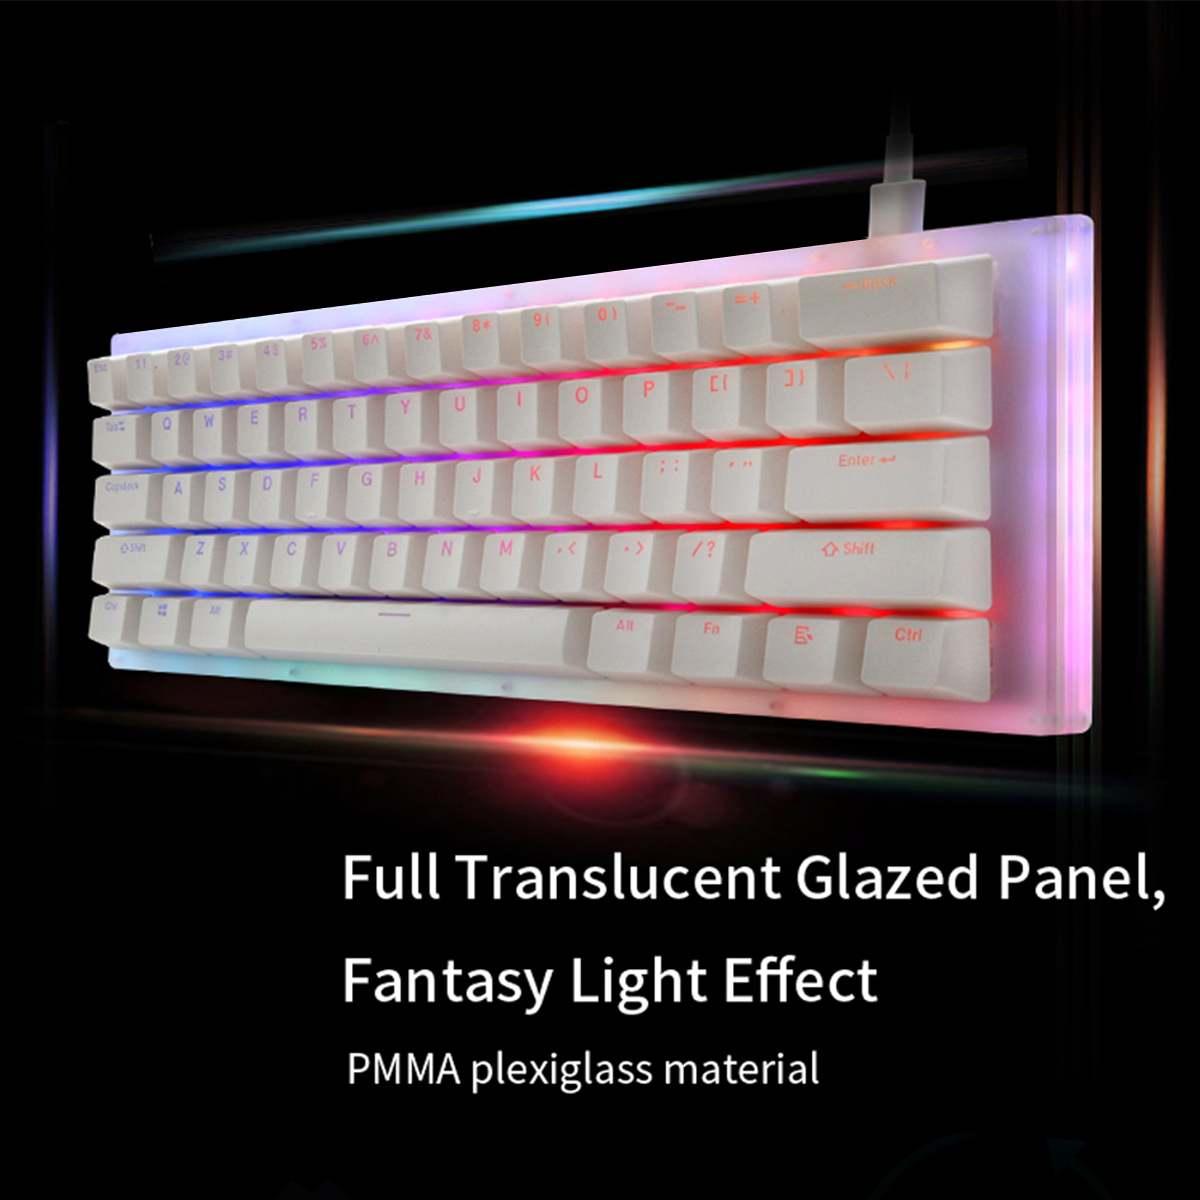 Gamakay K61 61 Keys Mechanical Gaming Keyboard Tyce-C Wired RGB Backlit keyboard Gateron Switch Crystalline Base Hot Swappable